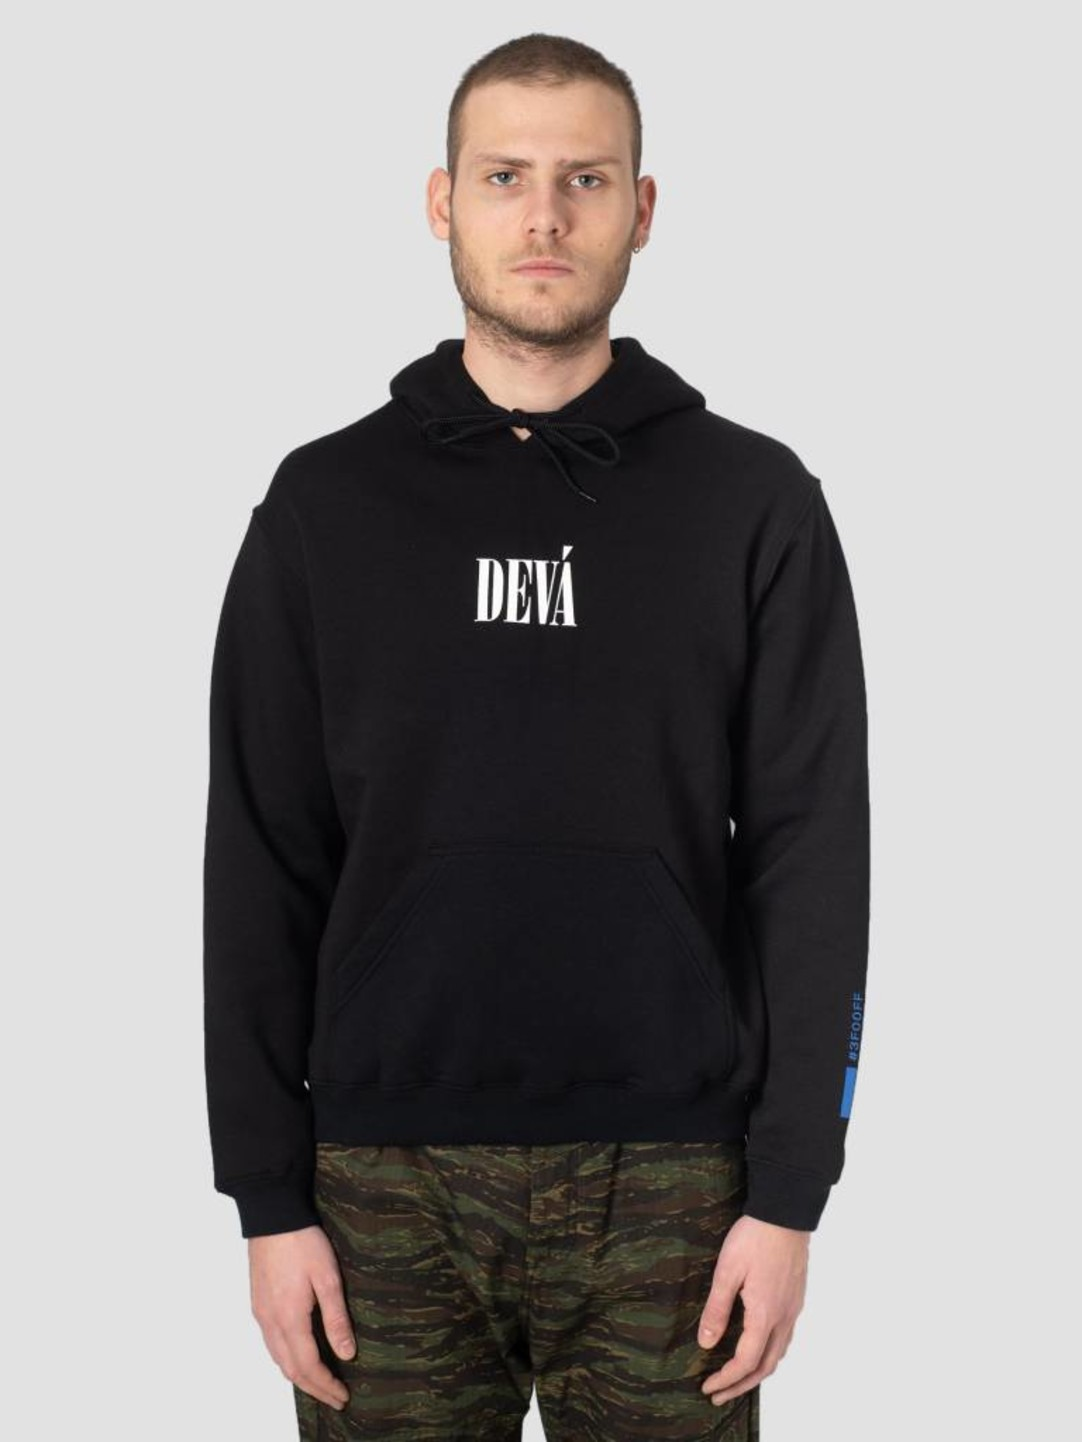 DEVA DEVA Hoodie Underdogs Black